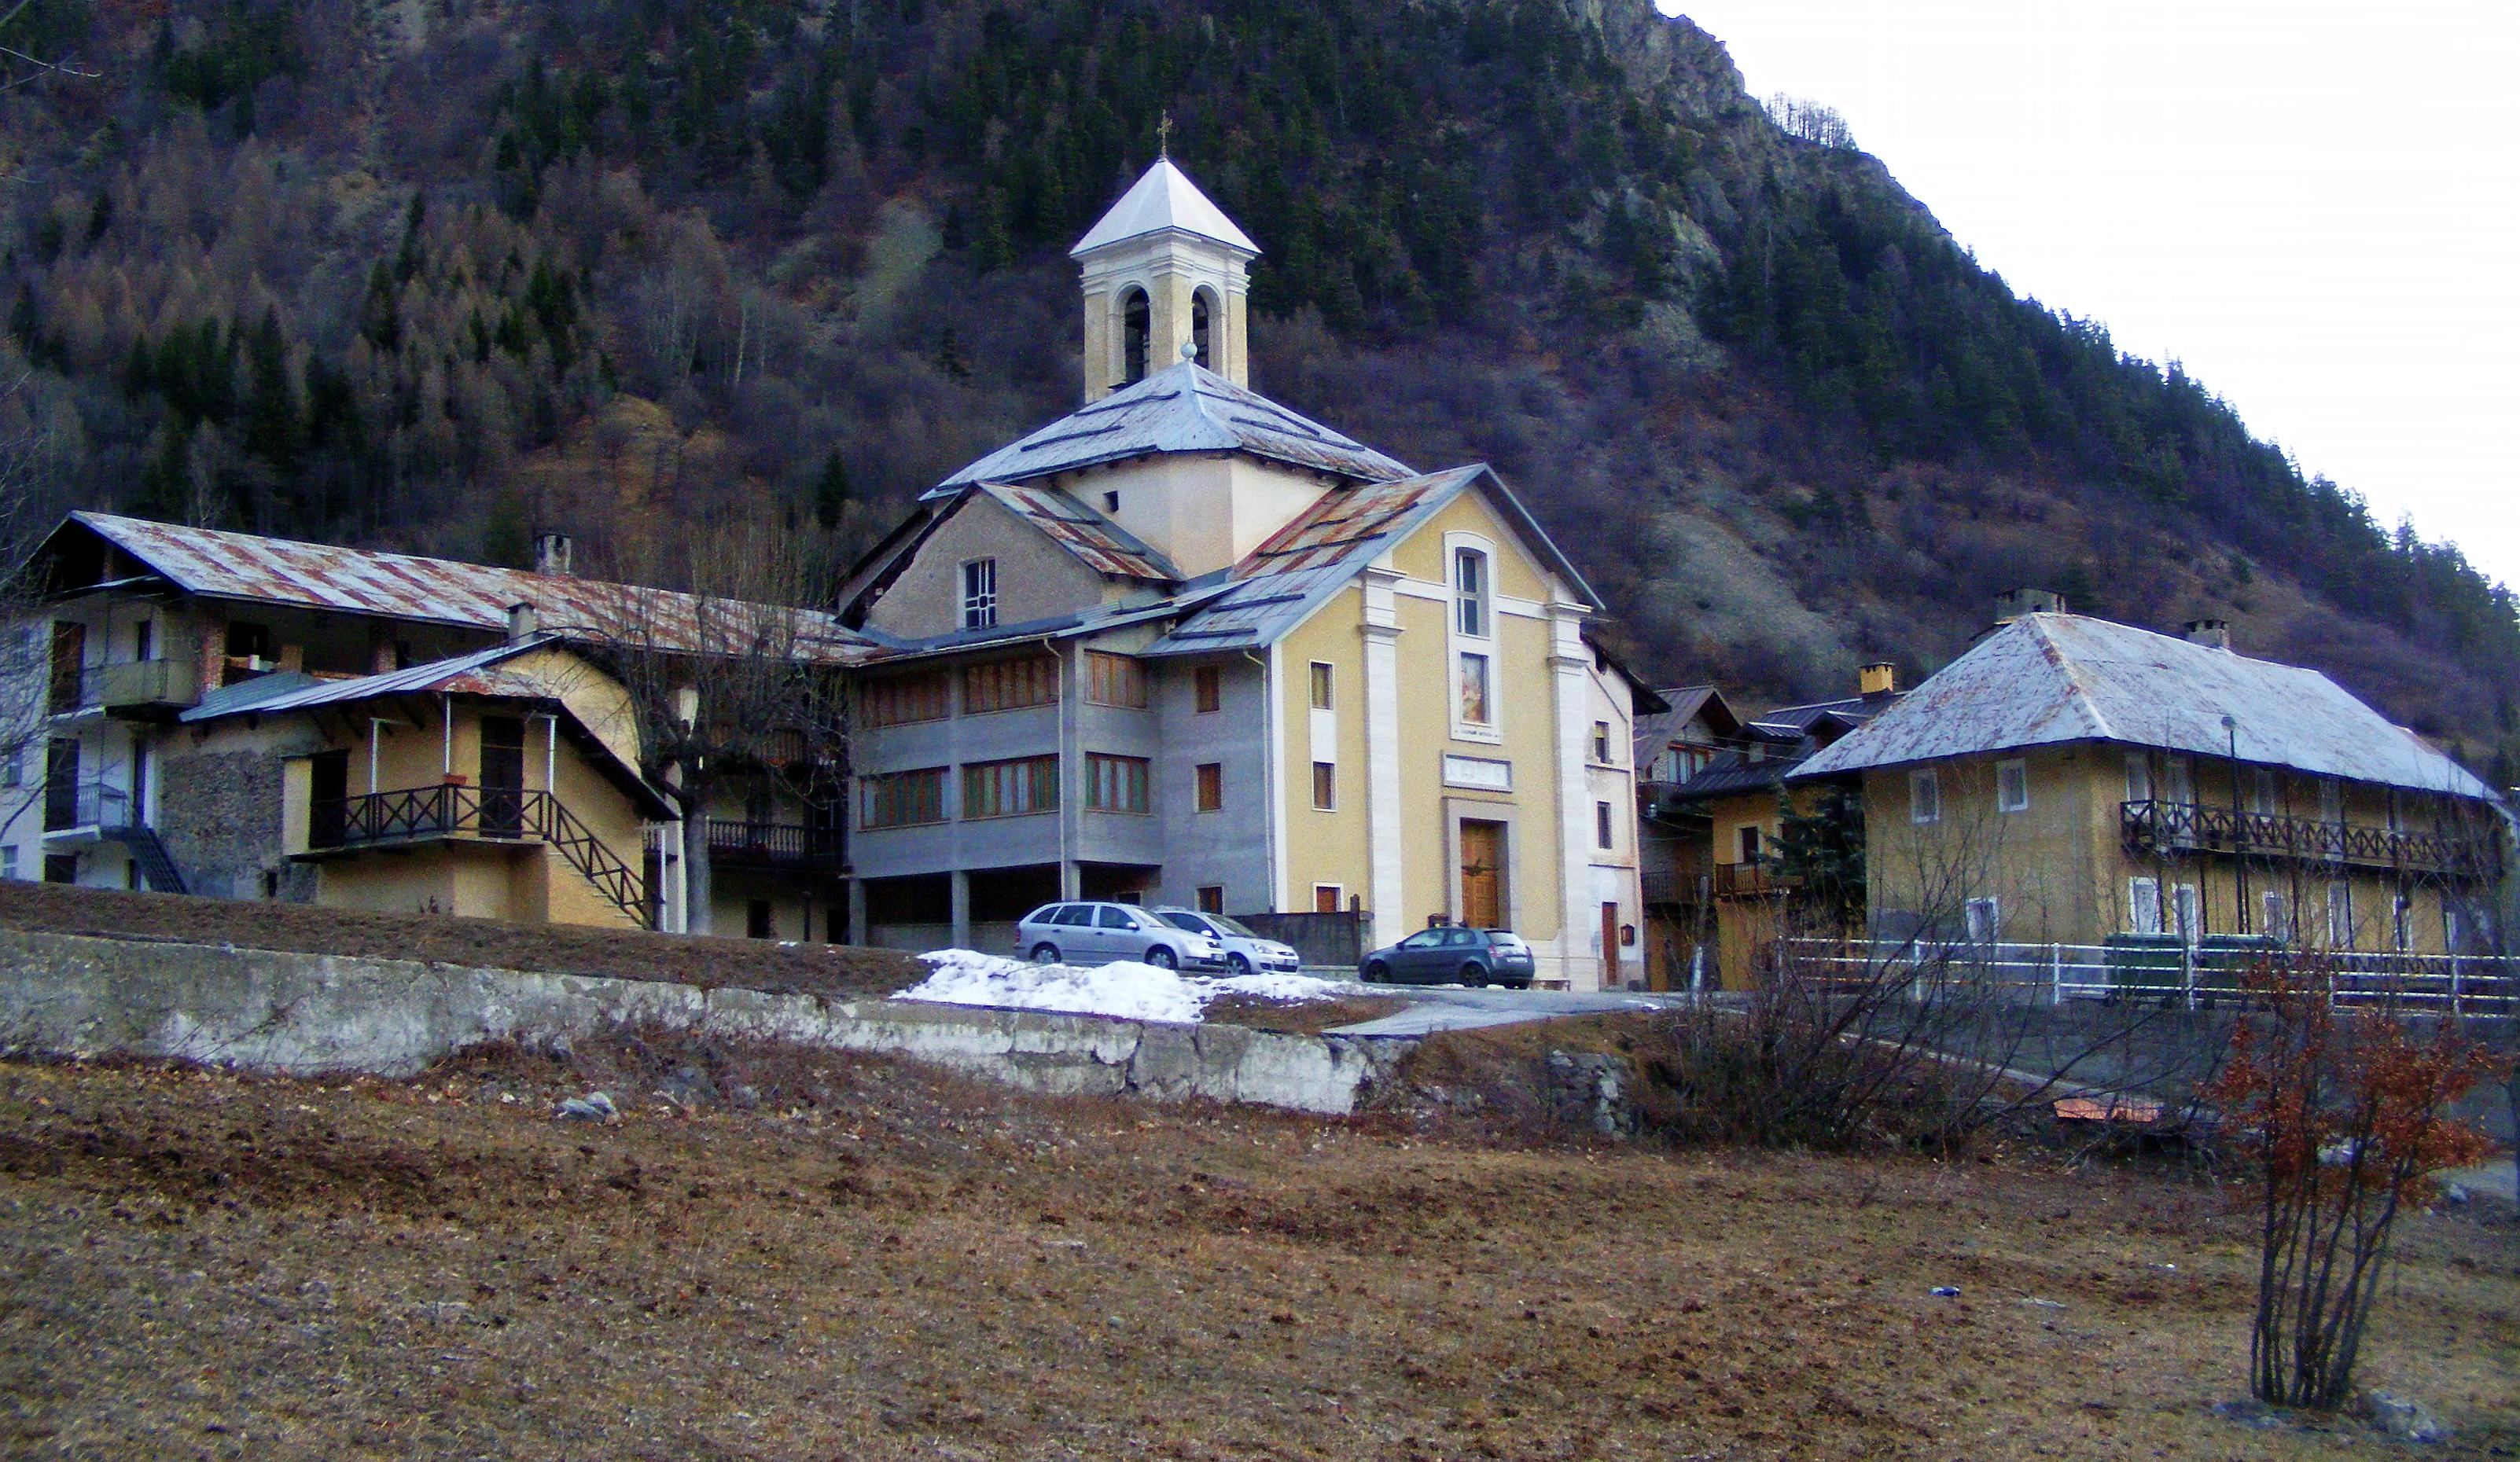 bagni : File:Bagni di vinadio chiesa parrocchiale.jpg - Wikimedia Commons